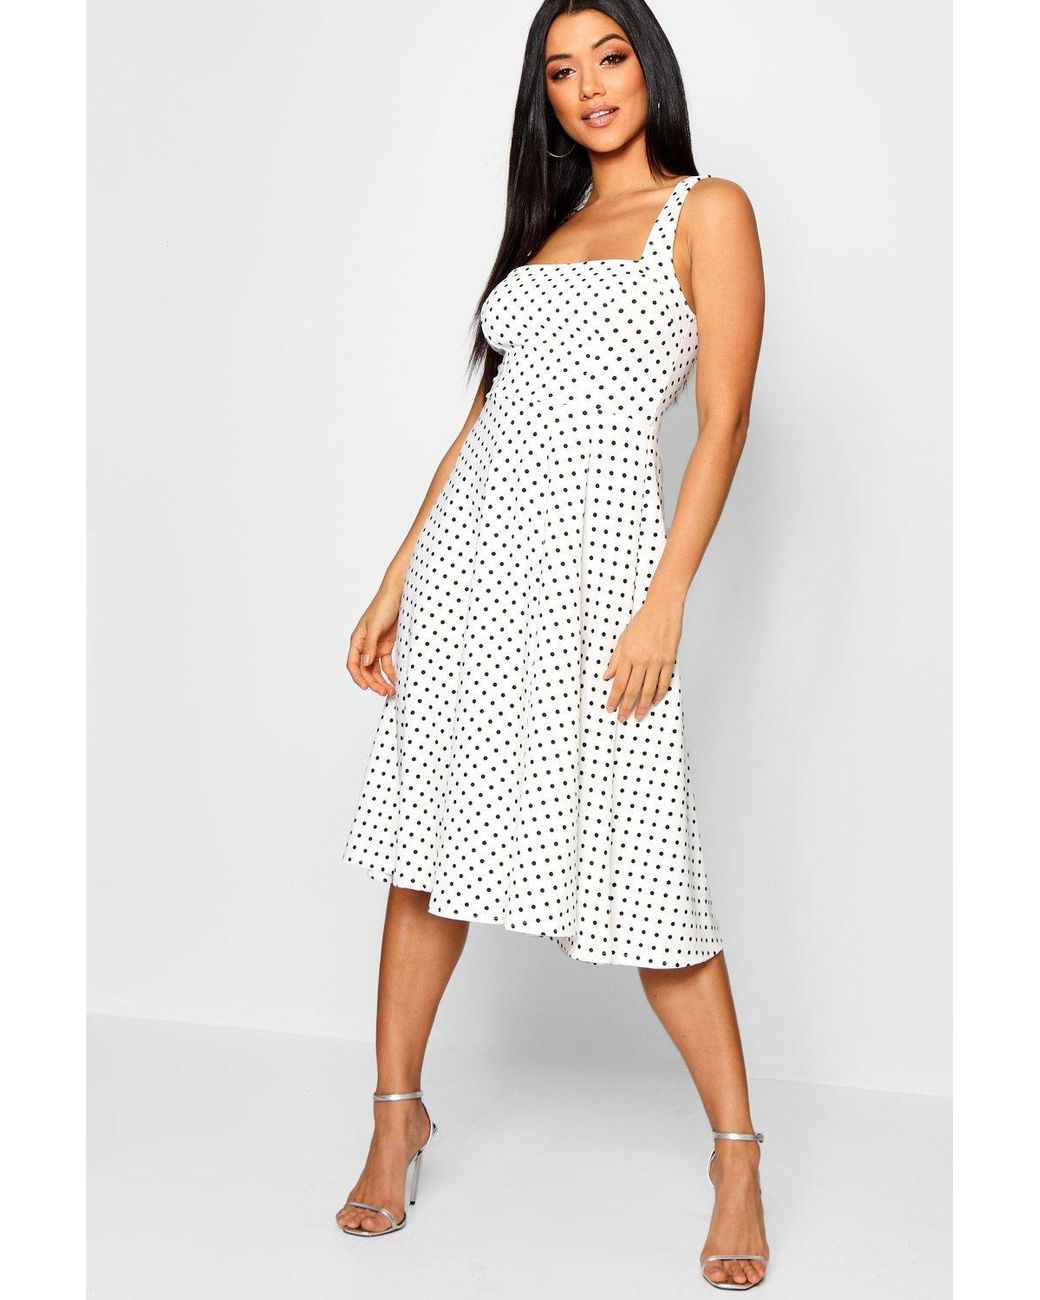 5180b475000a8 Lyst - Boohoo Polka Dot Square Neck Midi Skater Dress in White